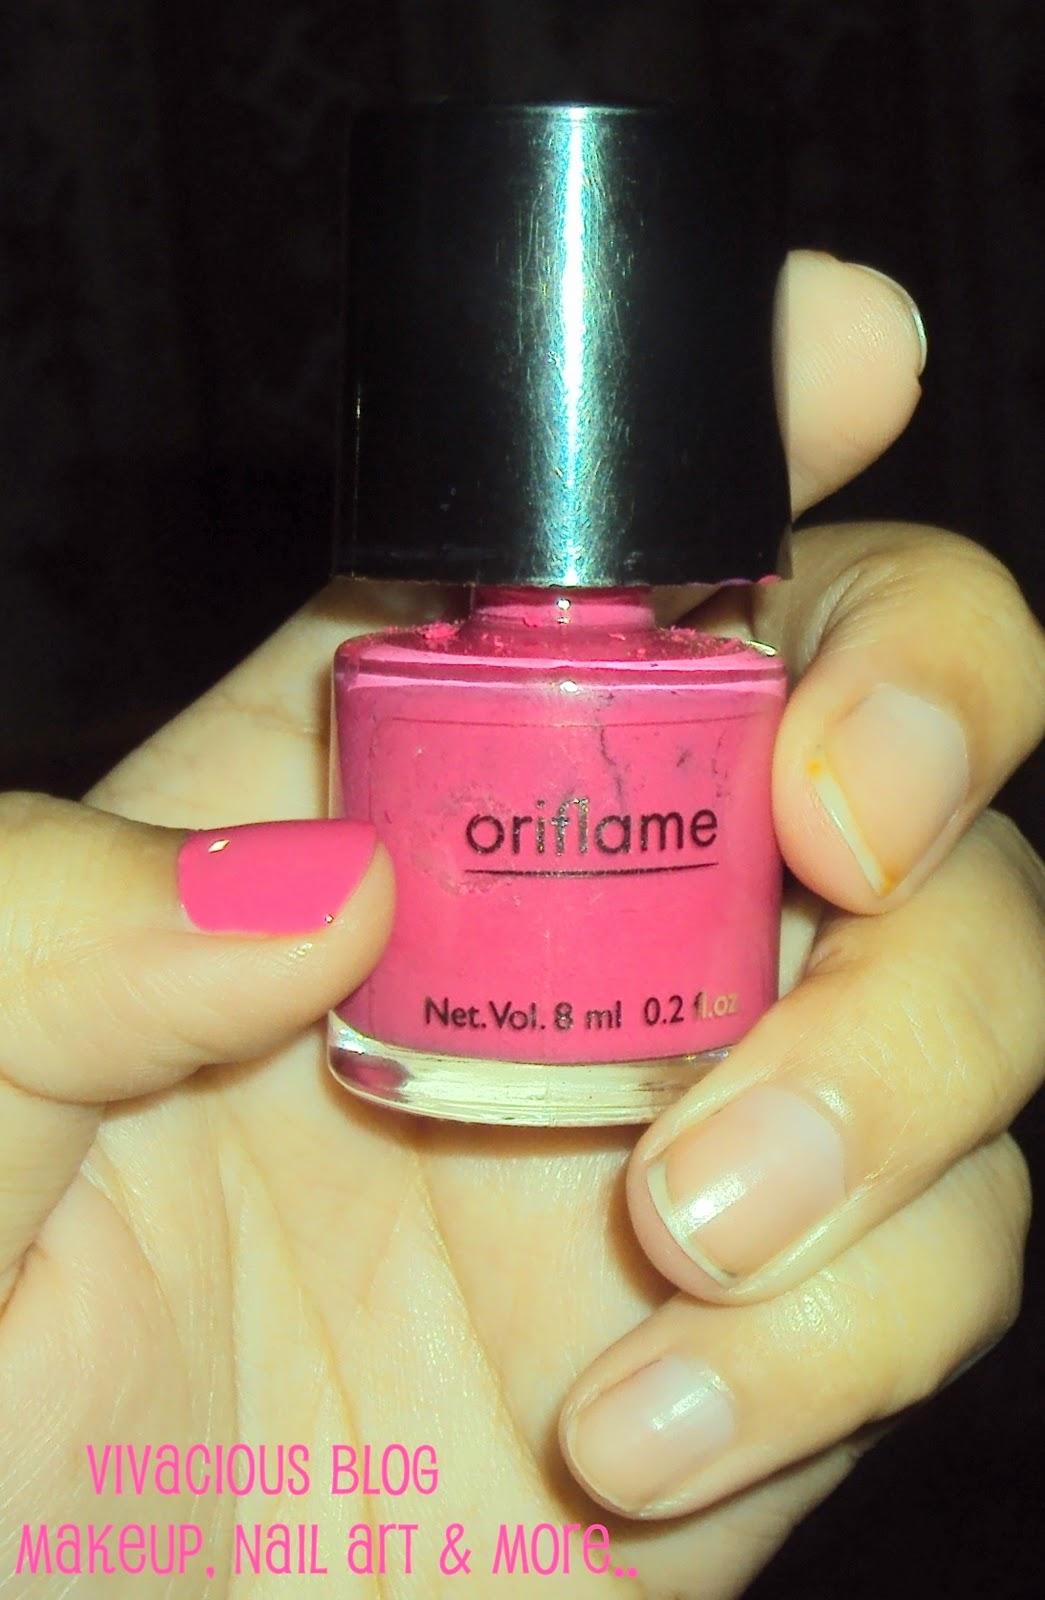 Vivacious Blog: Oriflame Pure Color Nail Polish Intense Pink